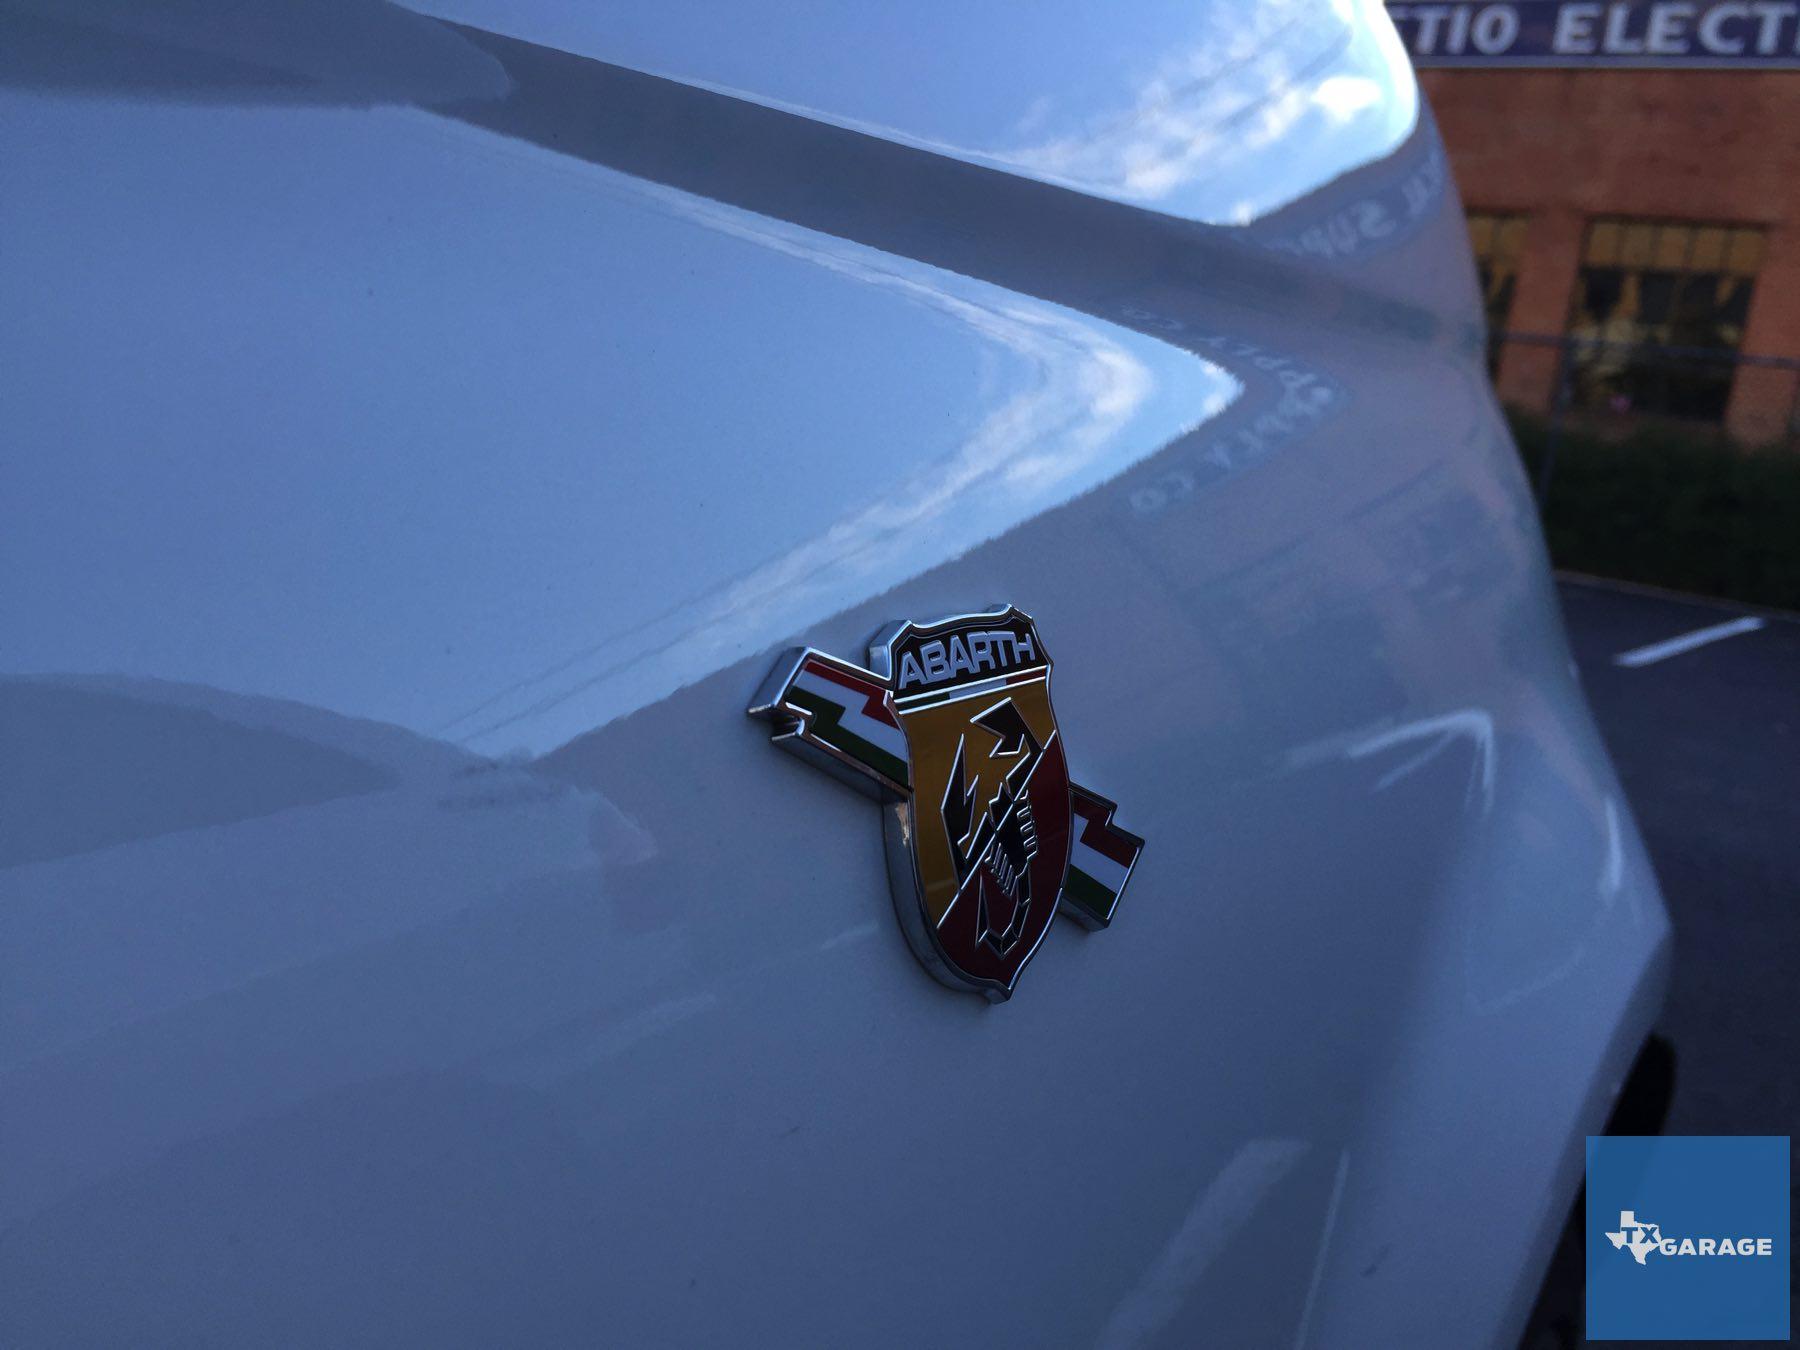 2015-Fiat-500-Abarth-txGarage-009